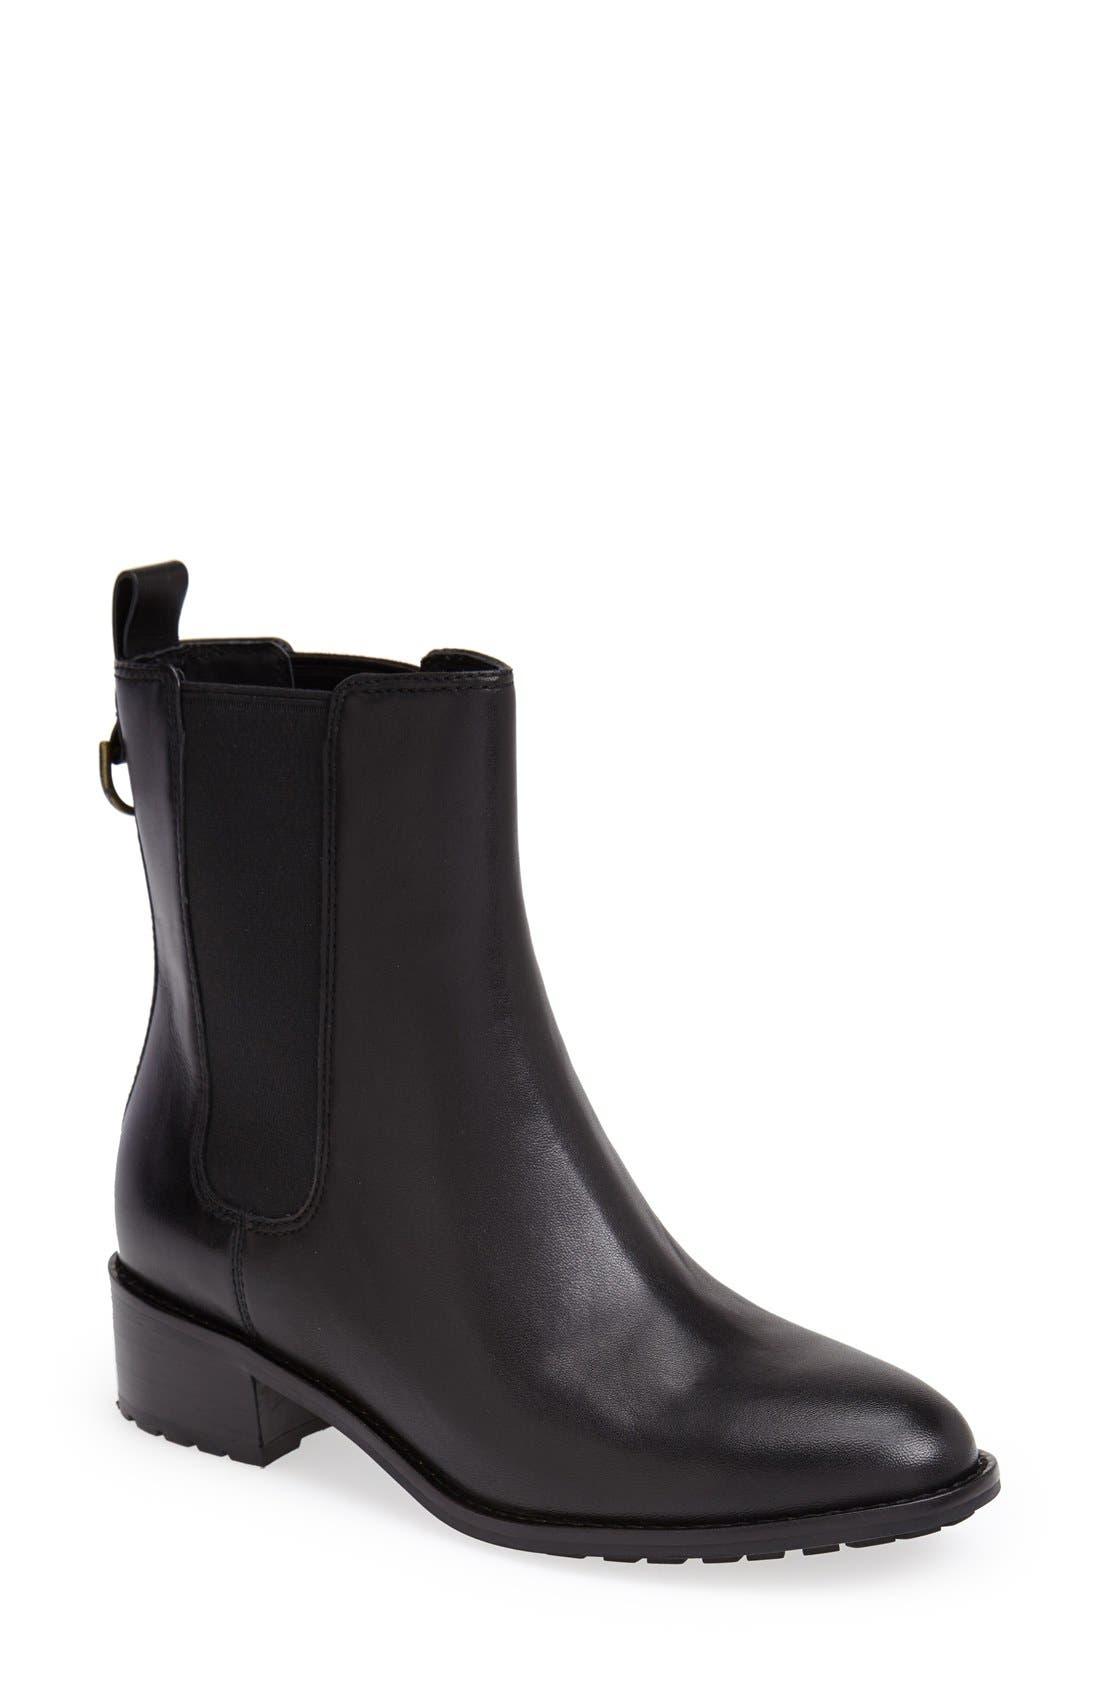 Alternate Image 1 Selected - Cole Haan 'Daryl' Waterproof Chelsea Boot (Women)